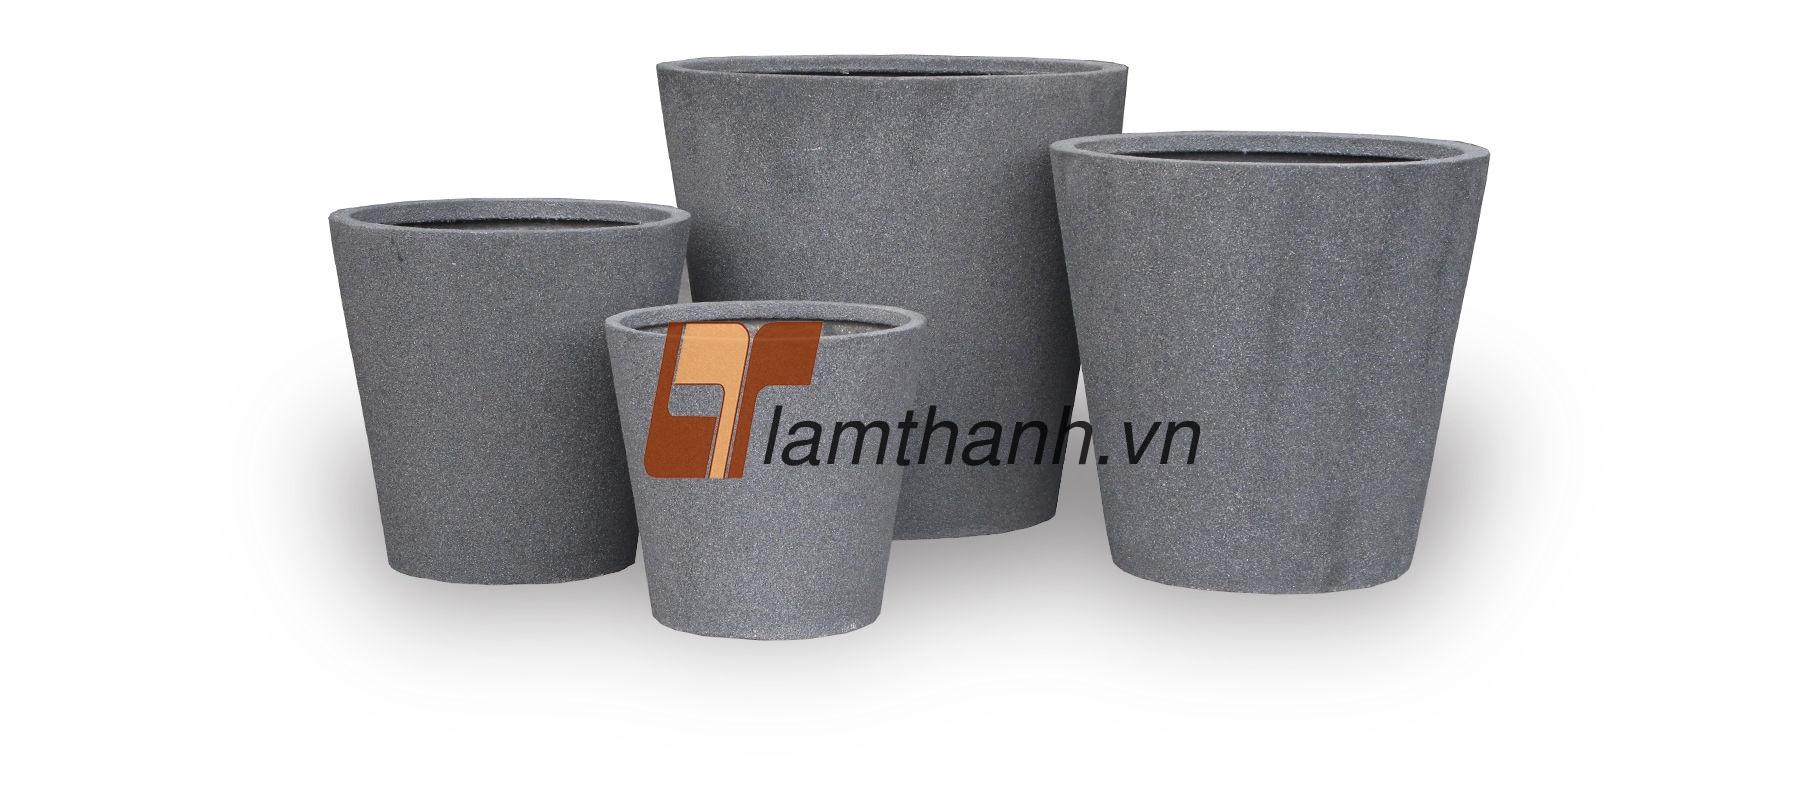 vietnam polystone, fiberglass 05